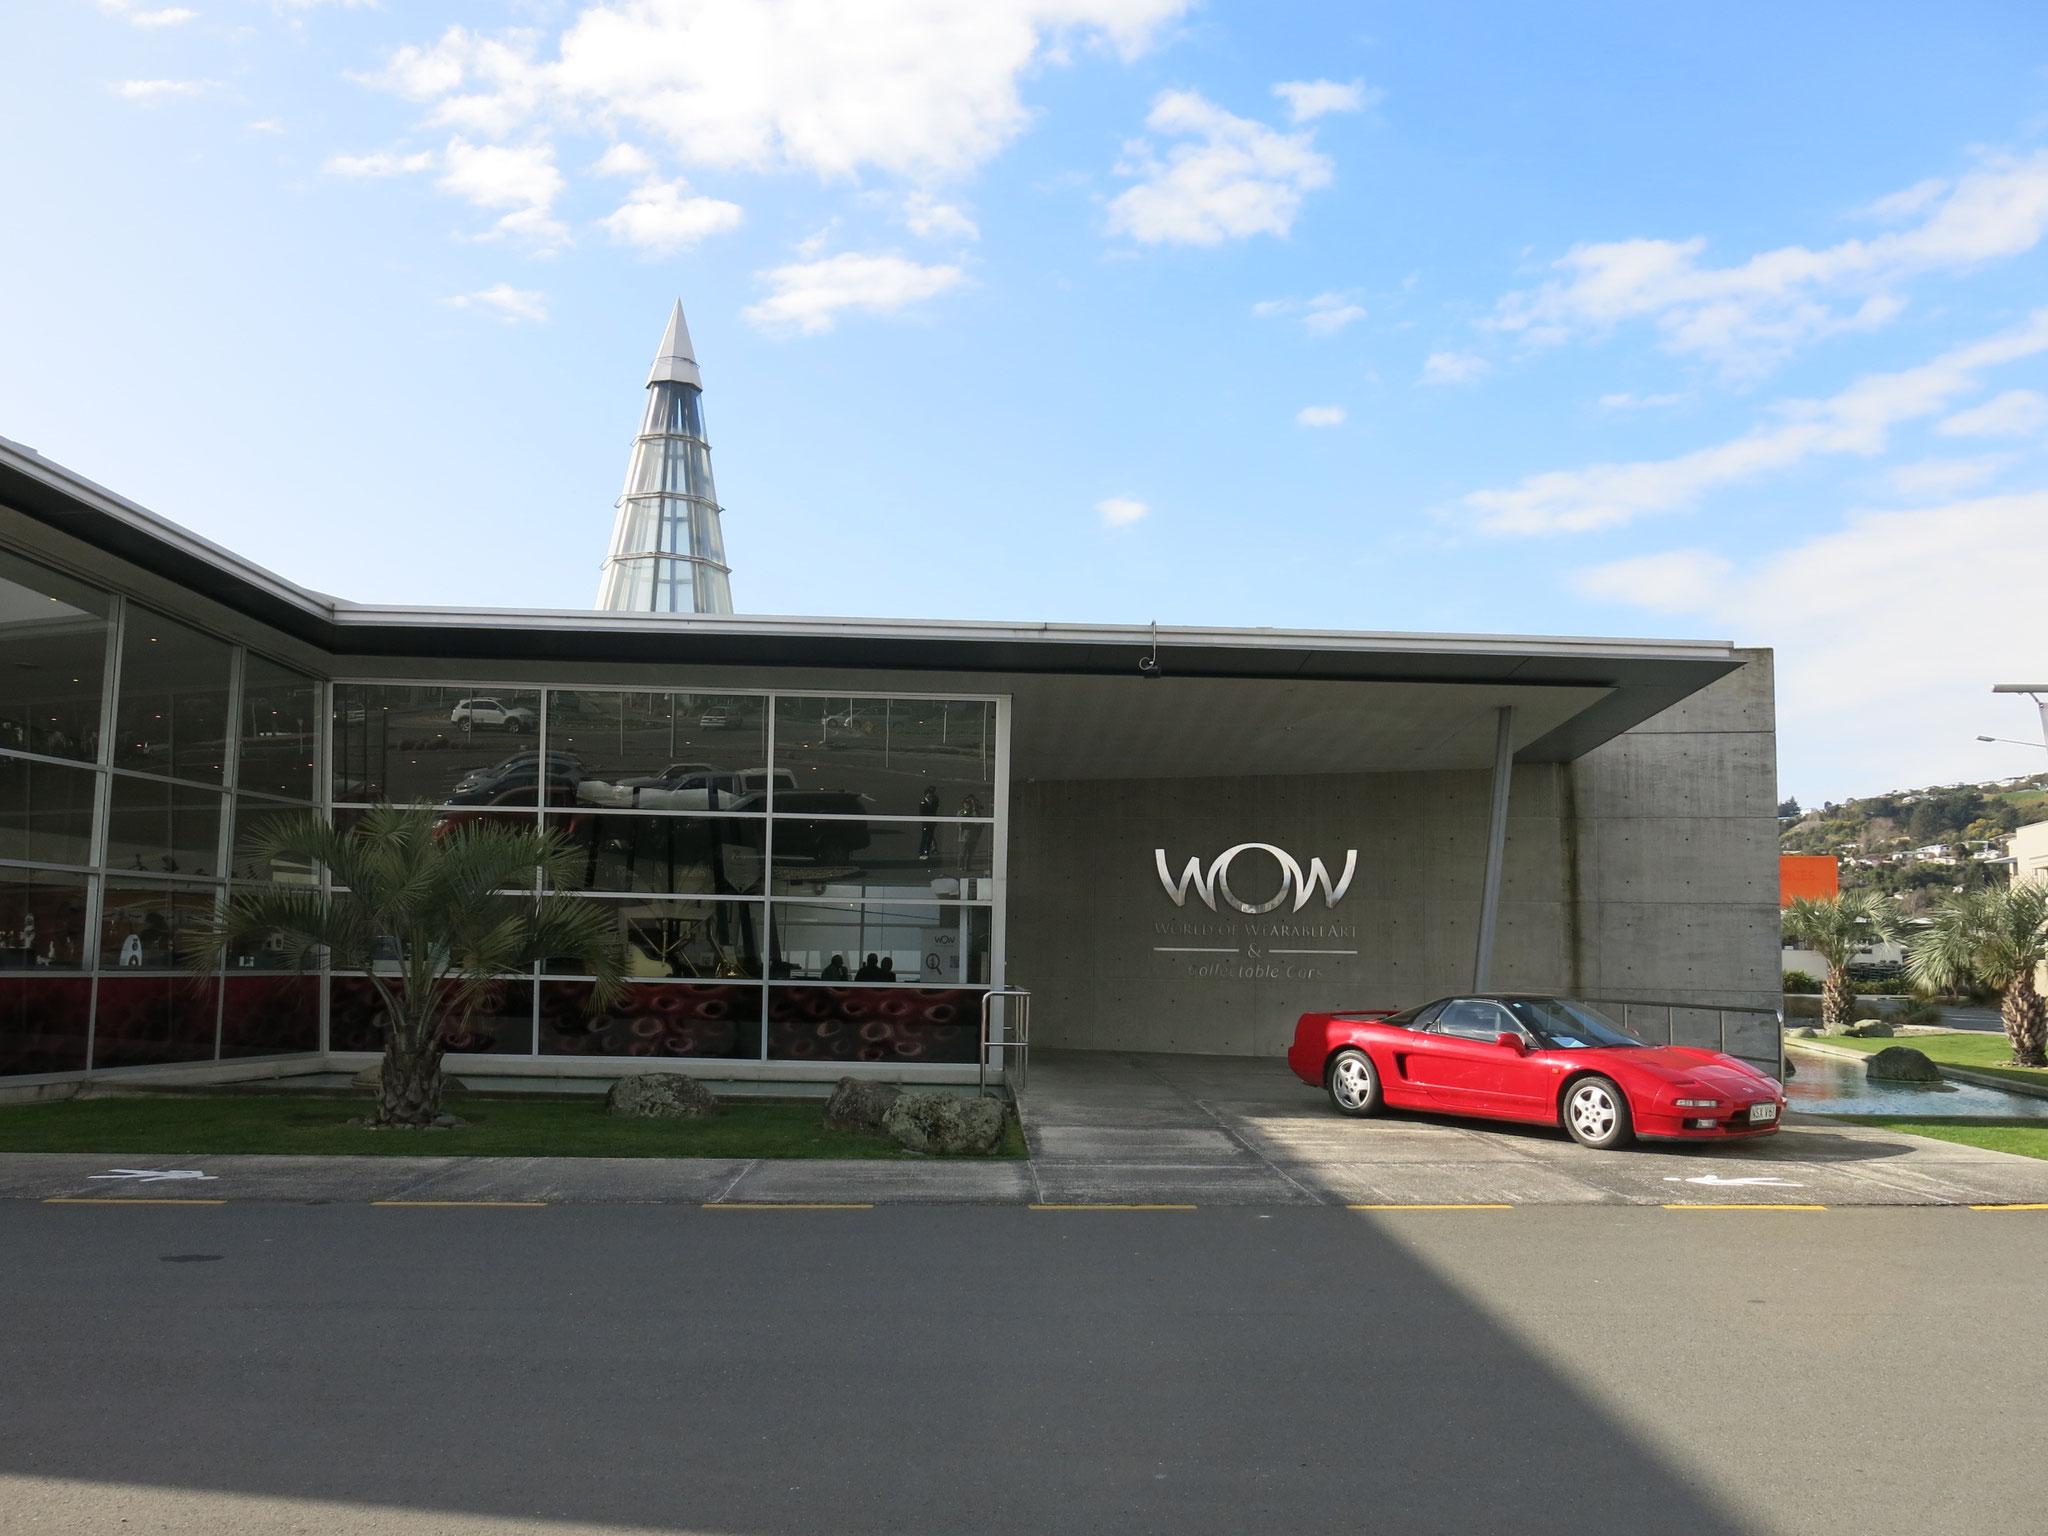 WOW (World of Wearable Art) Museum